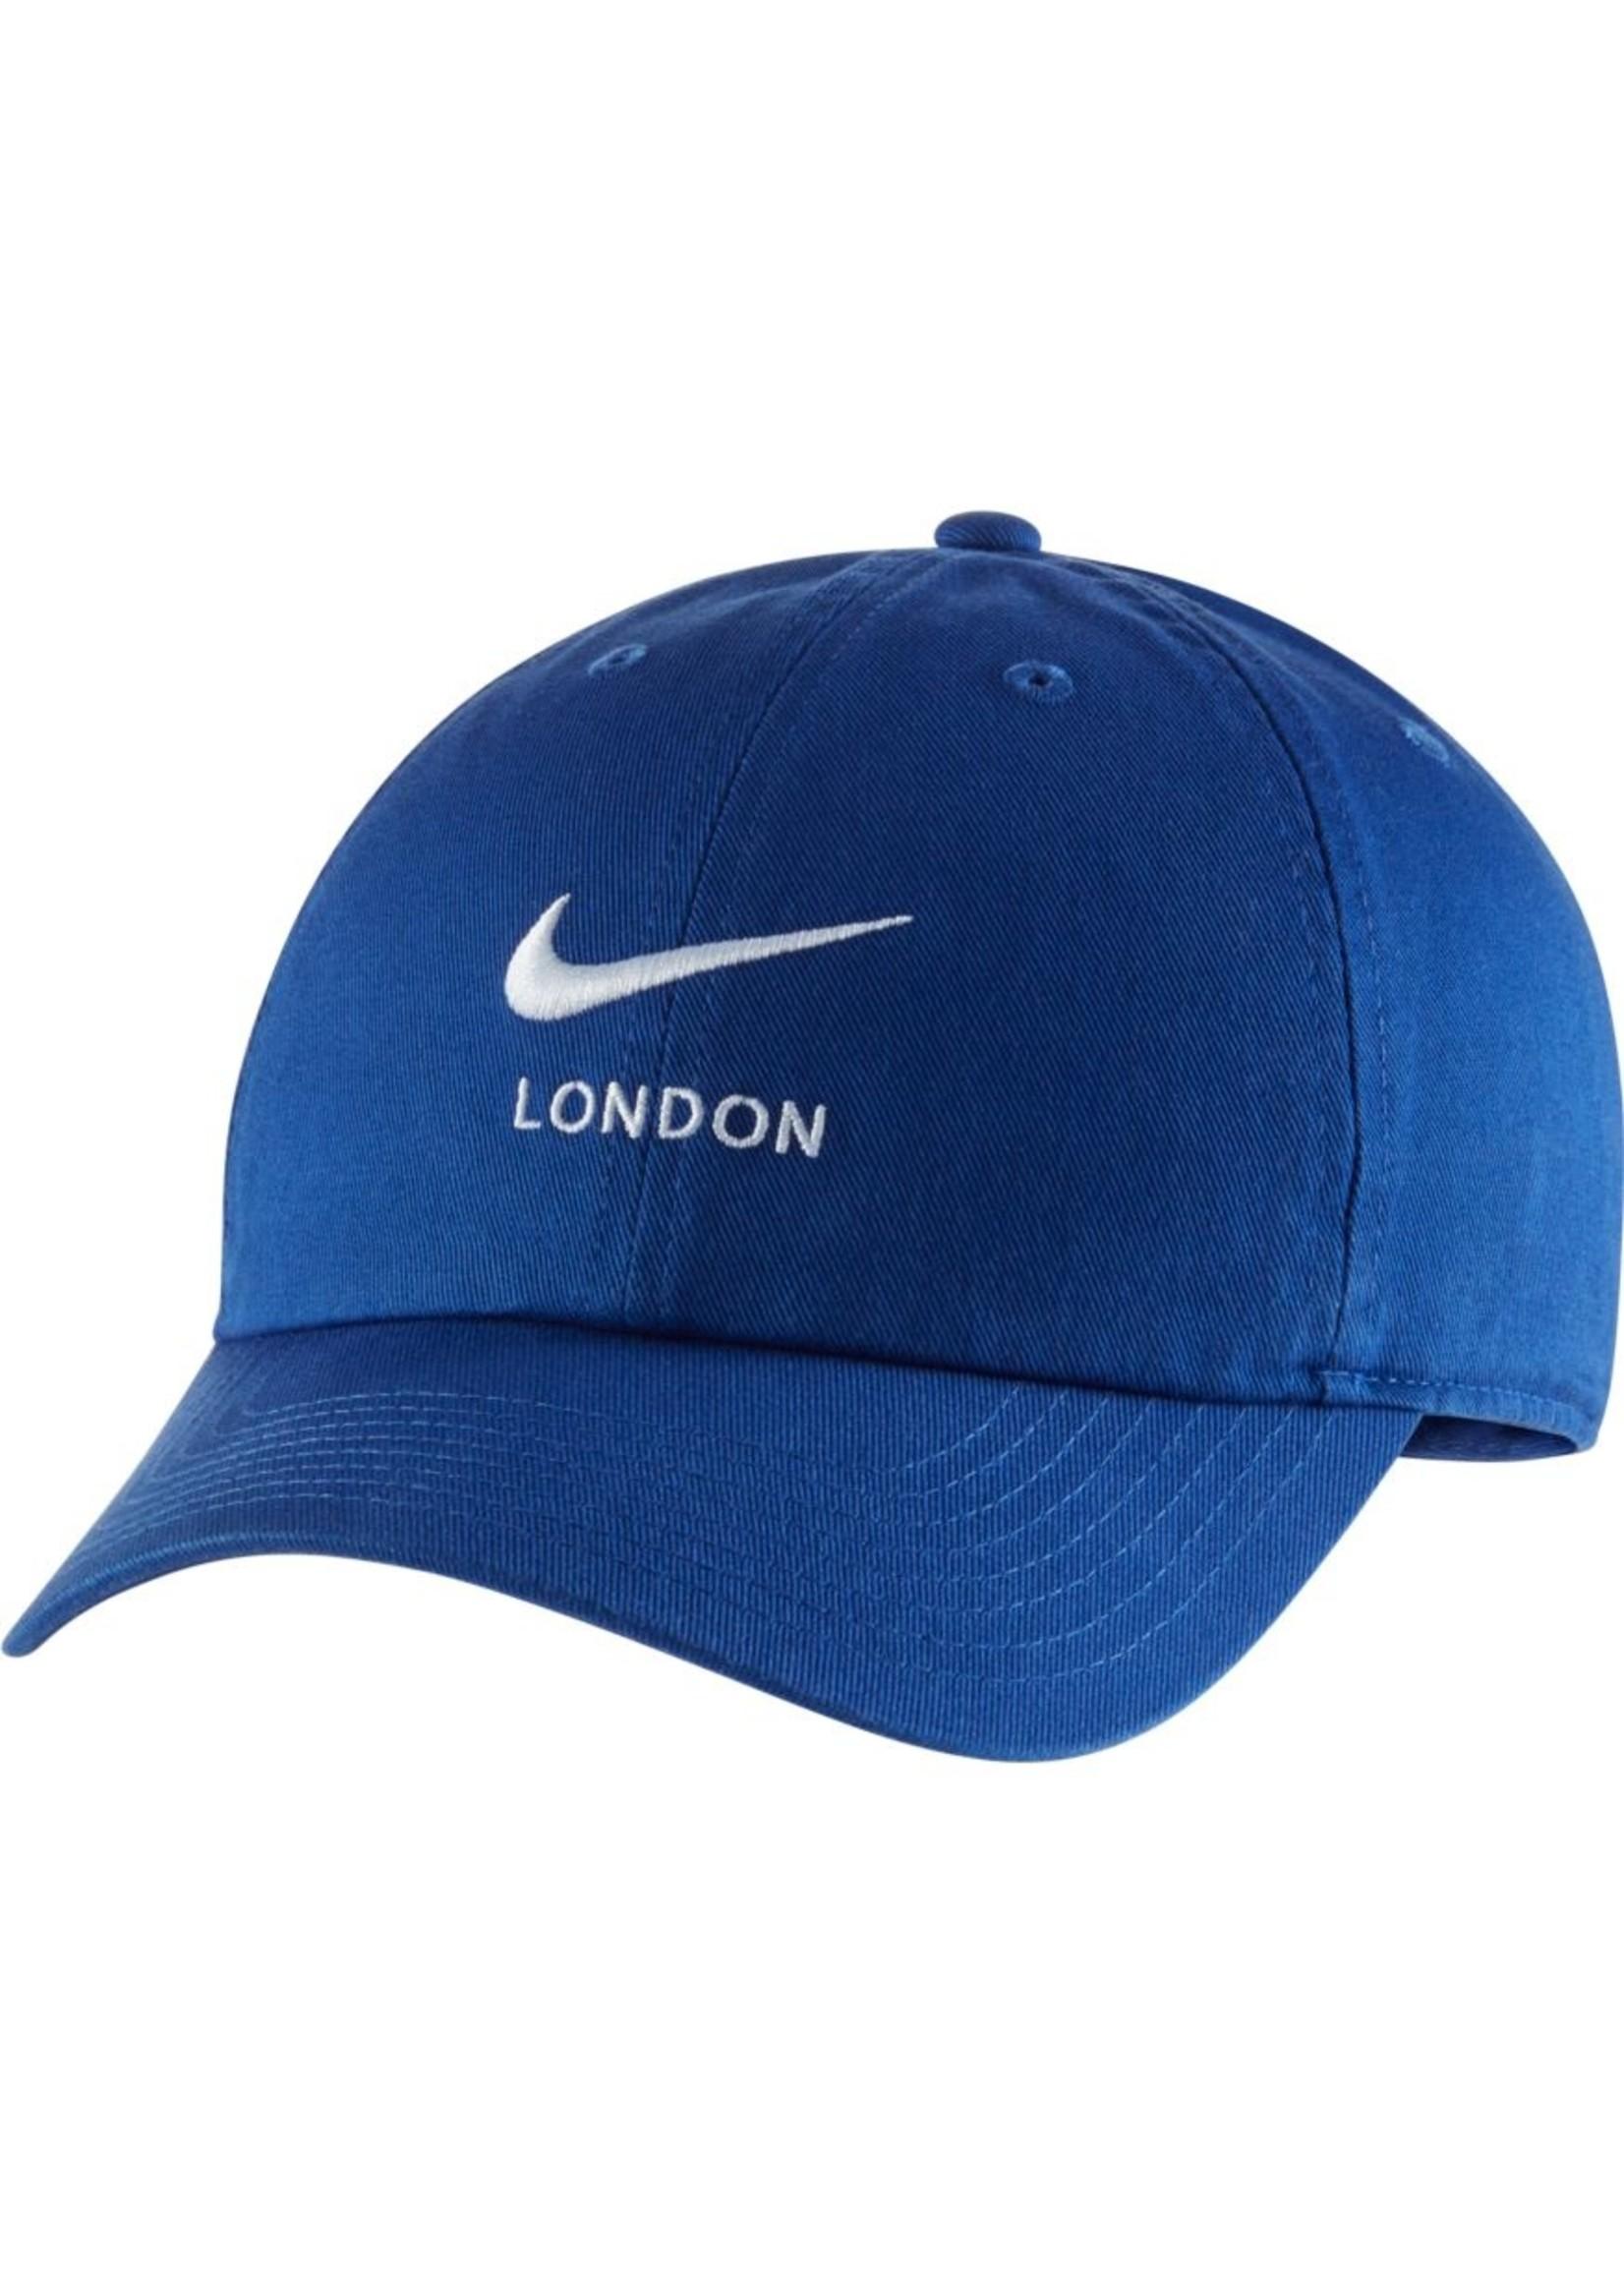 Nike Chelsea London Cap - Blue